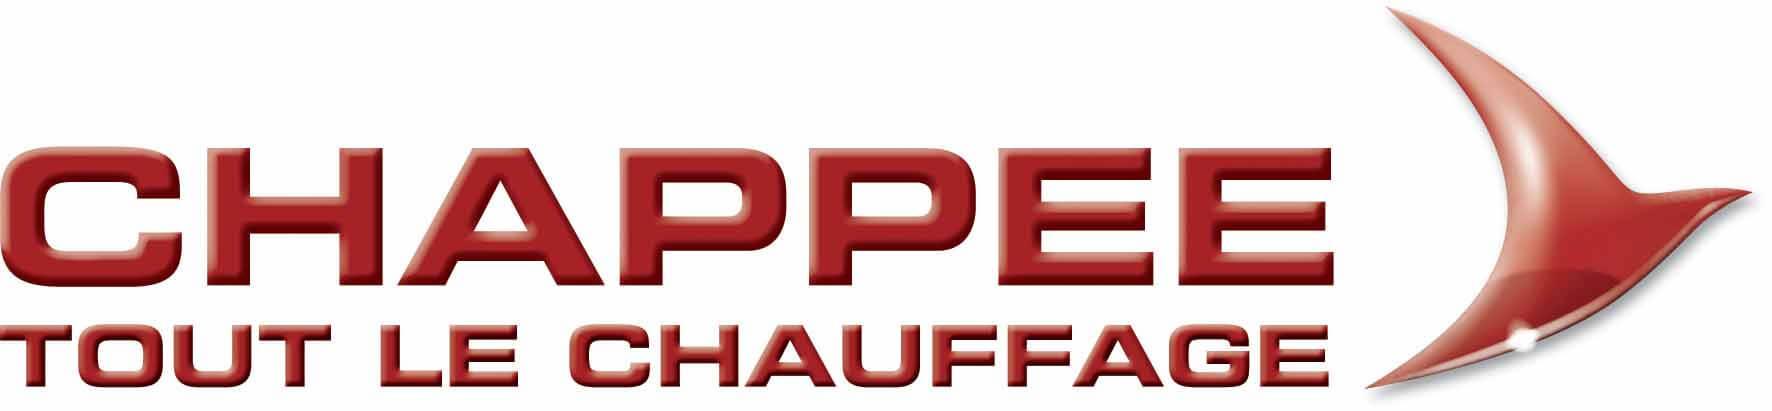 LOGO CHAPPEE -RUISSEAU CHAUFFAGE